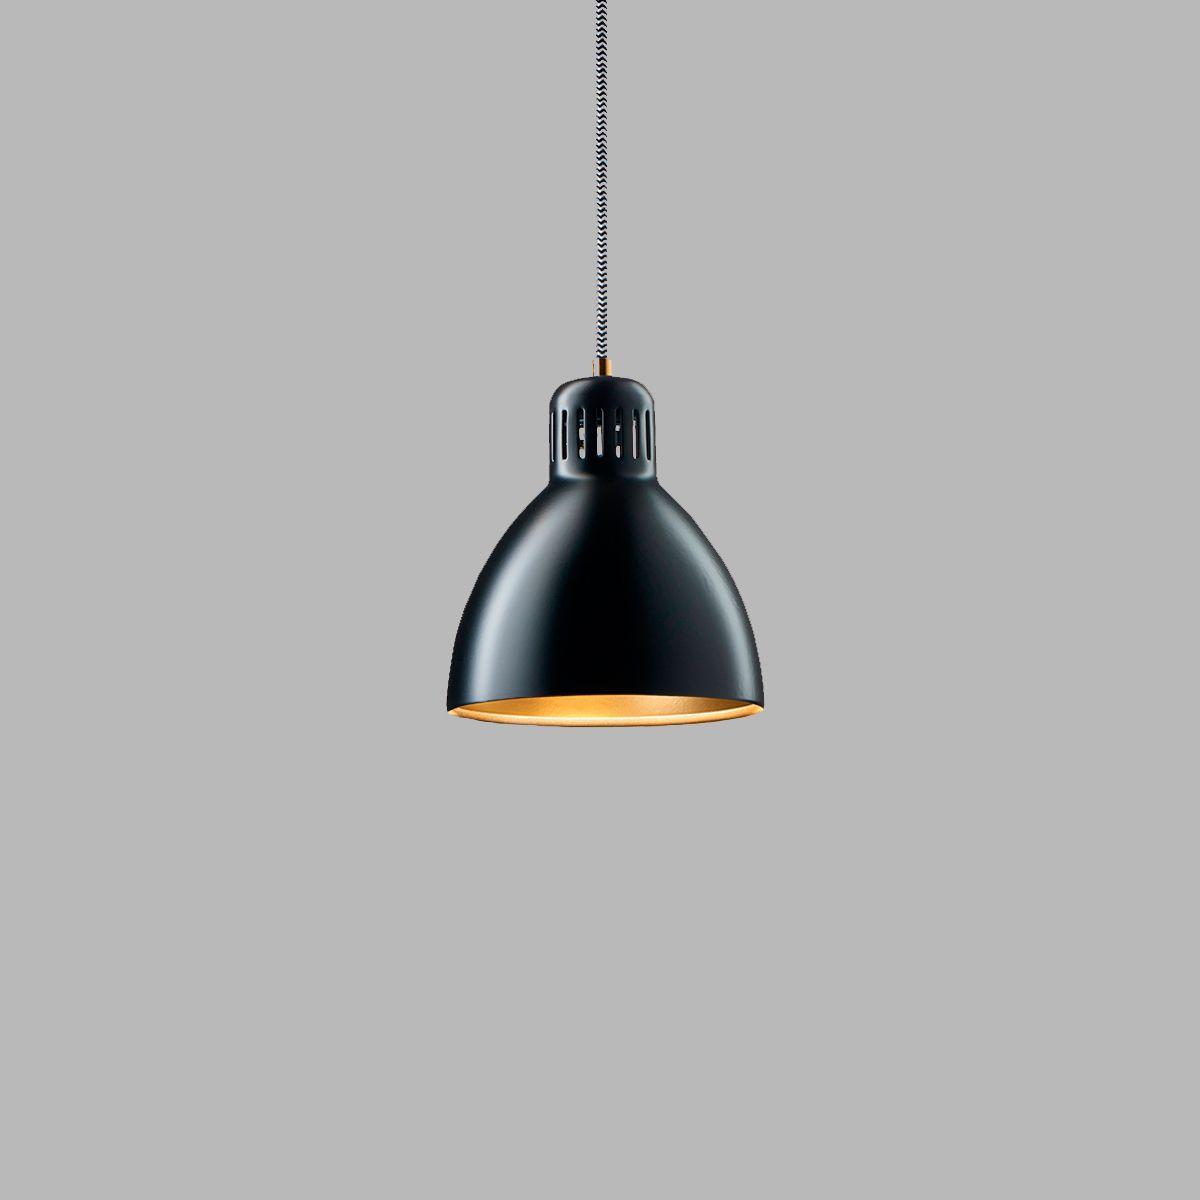 Lampe suspension / design industriel / en aluminium / blanche ...